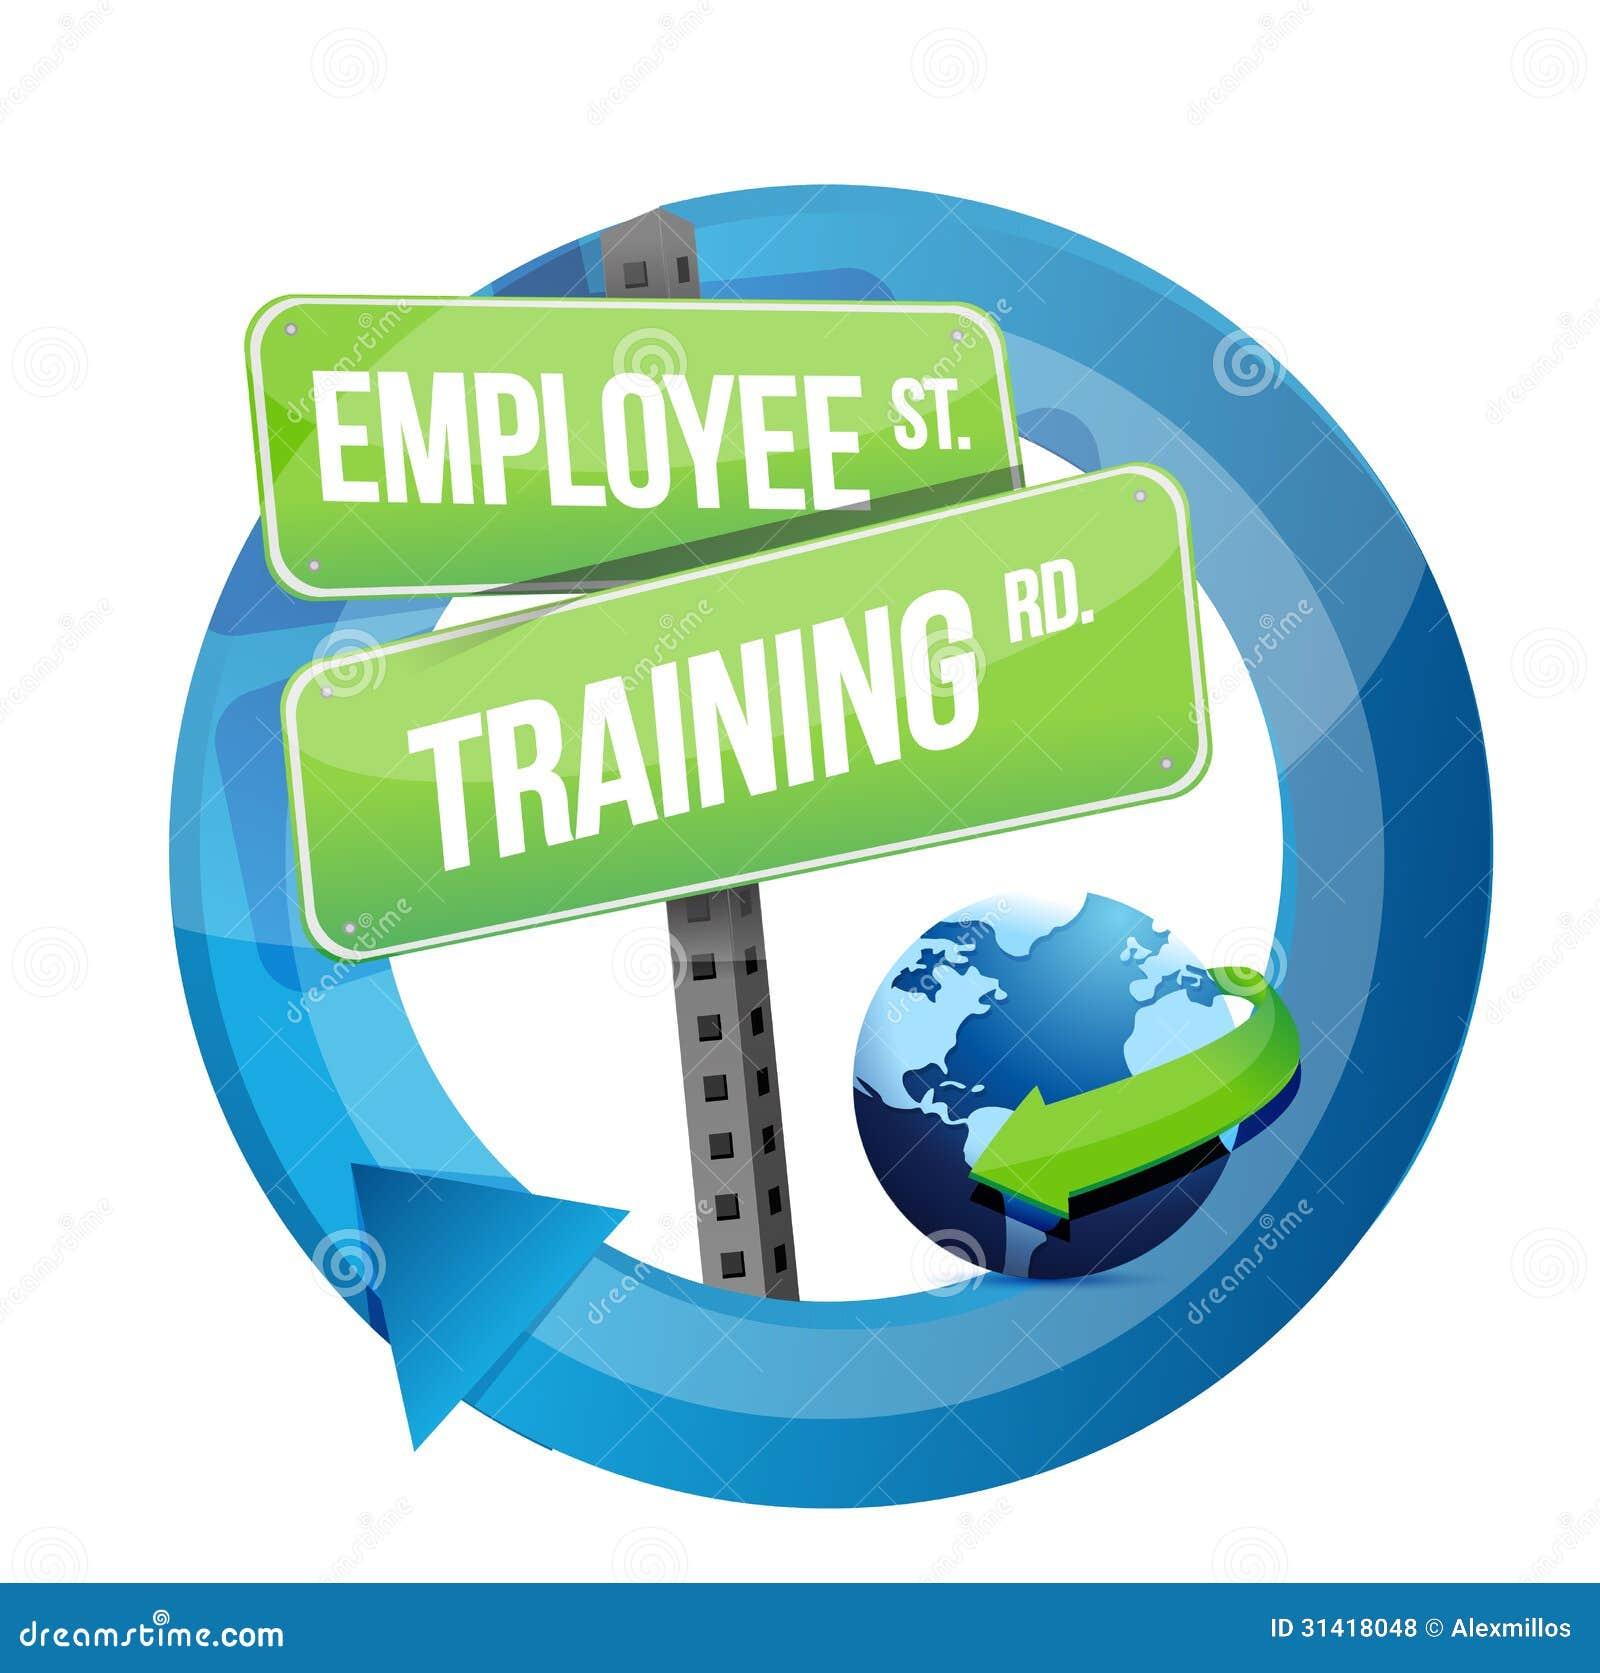 employee training road sign illustration design royalty free stock photos image 31418048 music staff clip art curvy music staff clip art transparent background